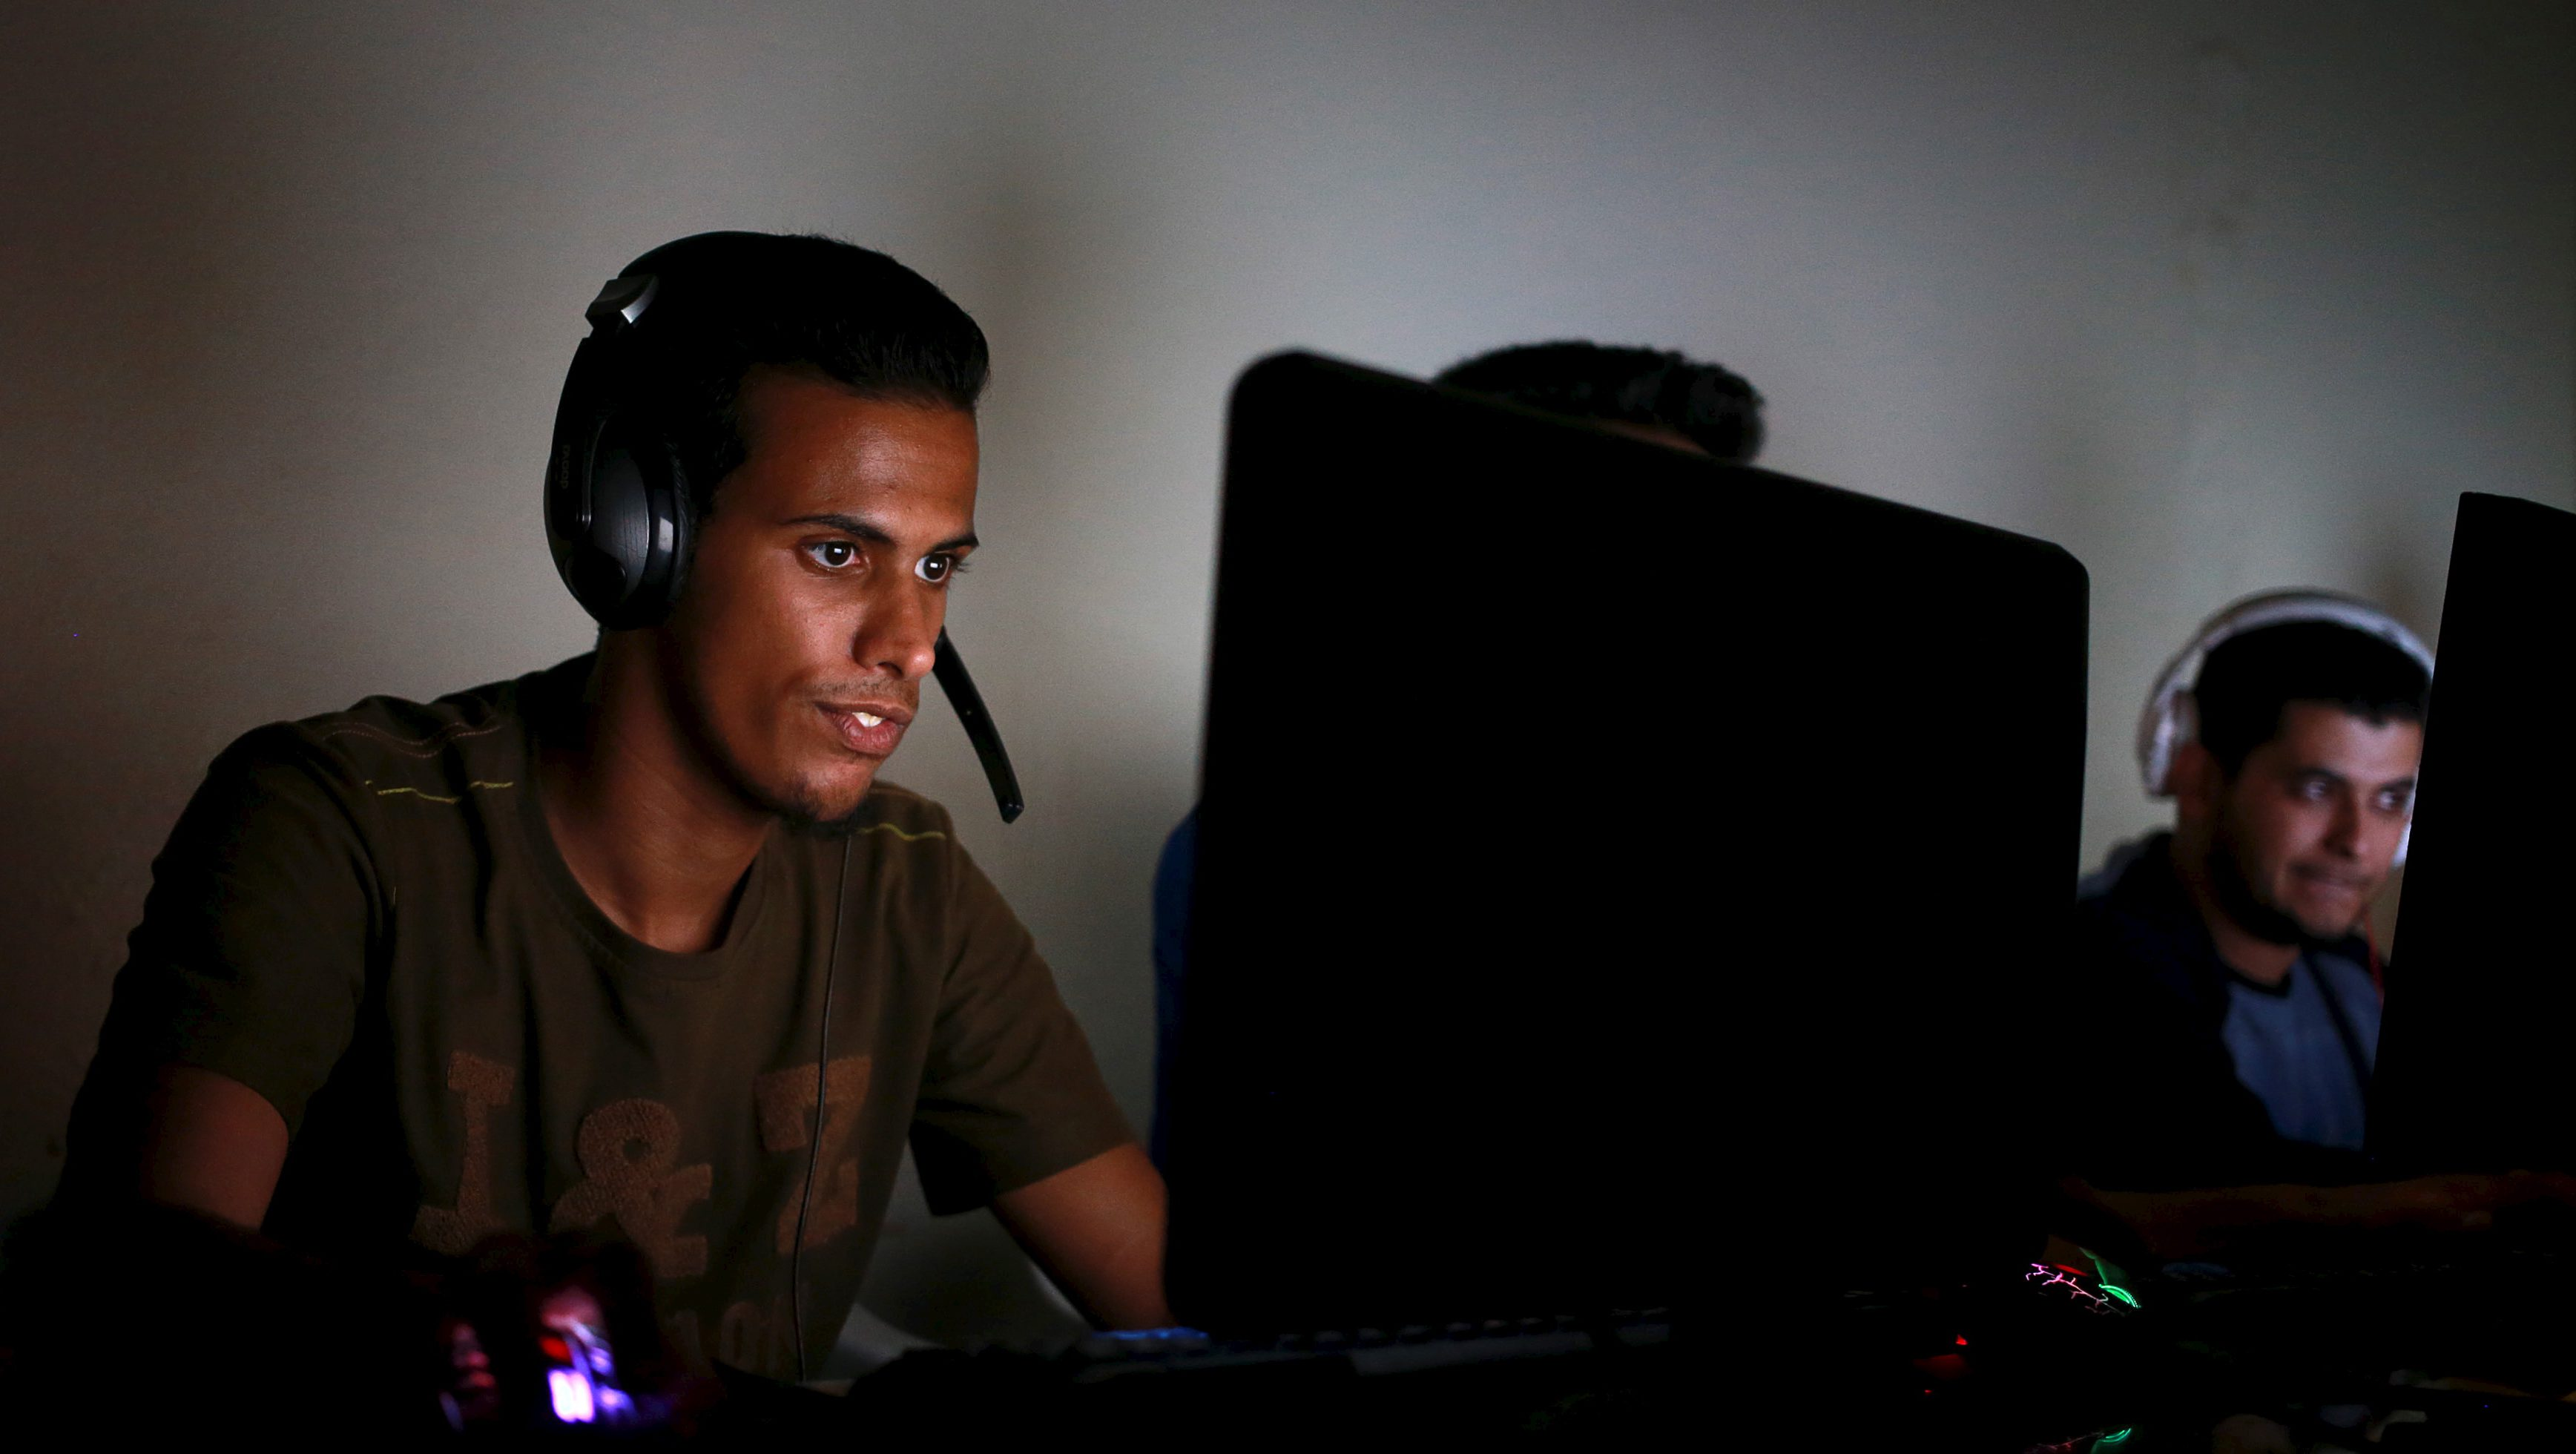 Libyans play computer games at an internet cafe in Benghazi, Libya April 10, 2016. Picture taken April 10, 2016. REUTERS/Esam Omran Al-Fetori - RTX29DBP